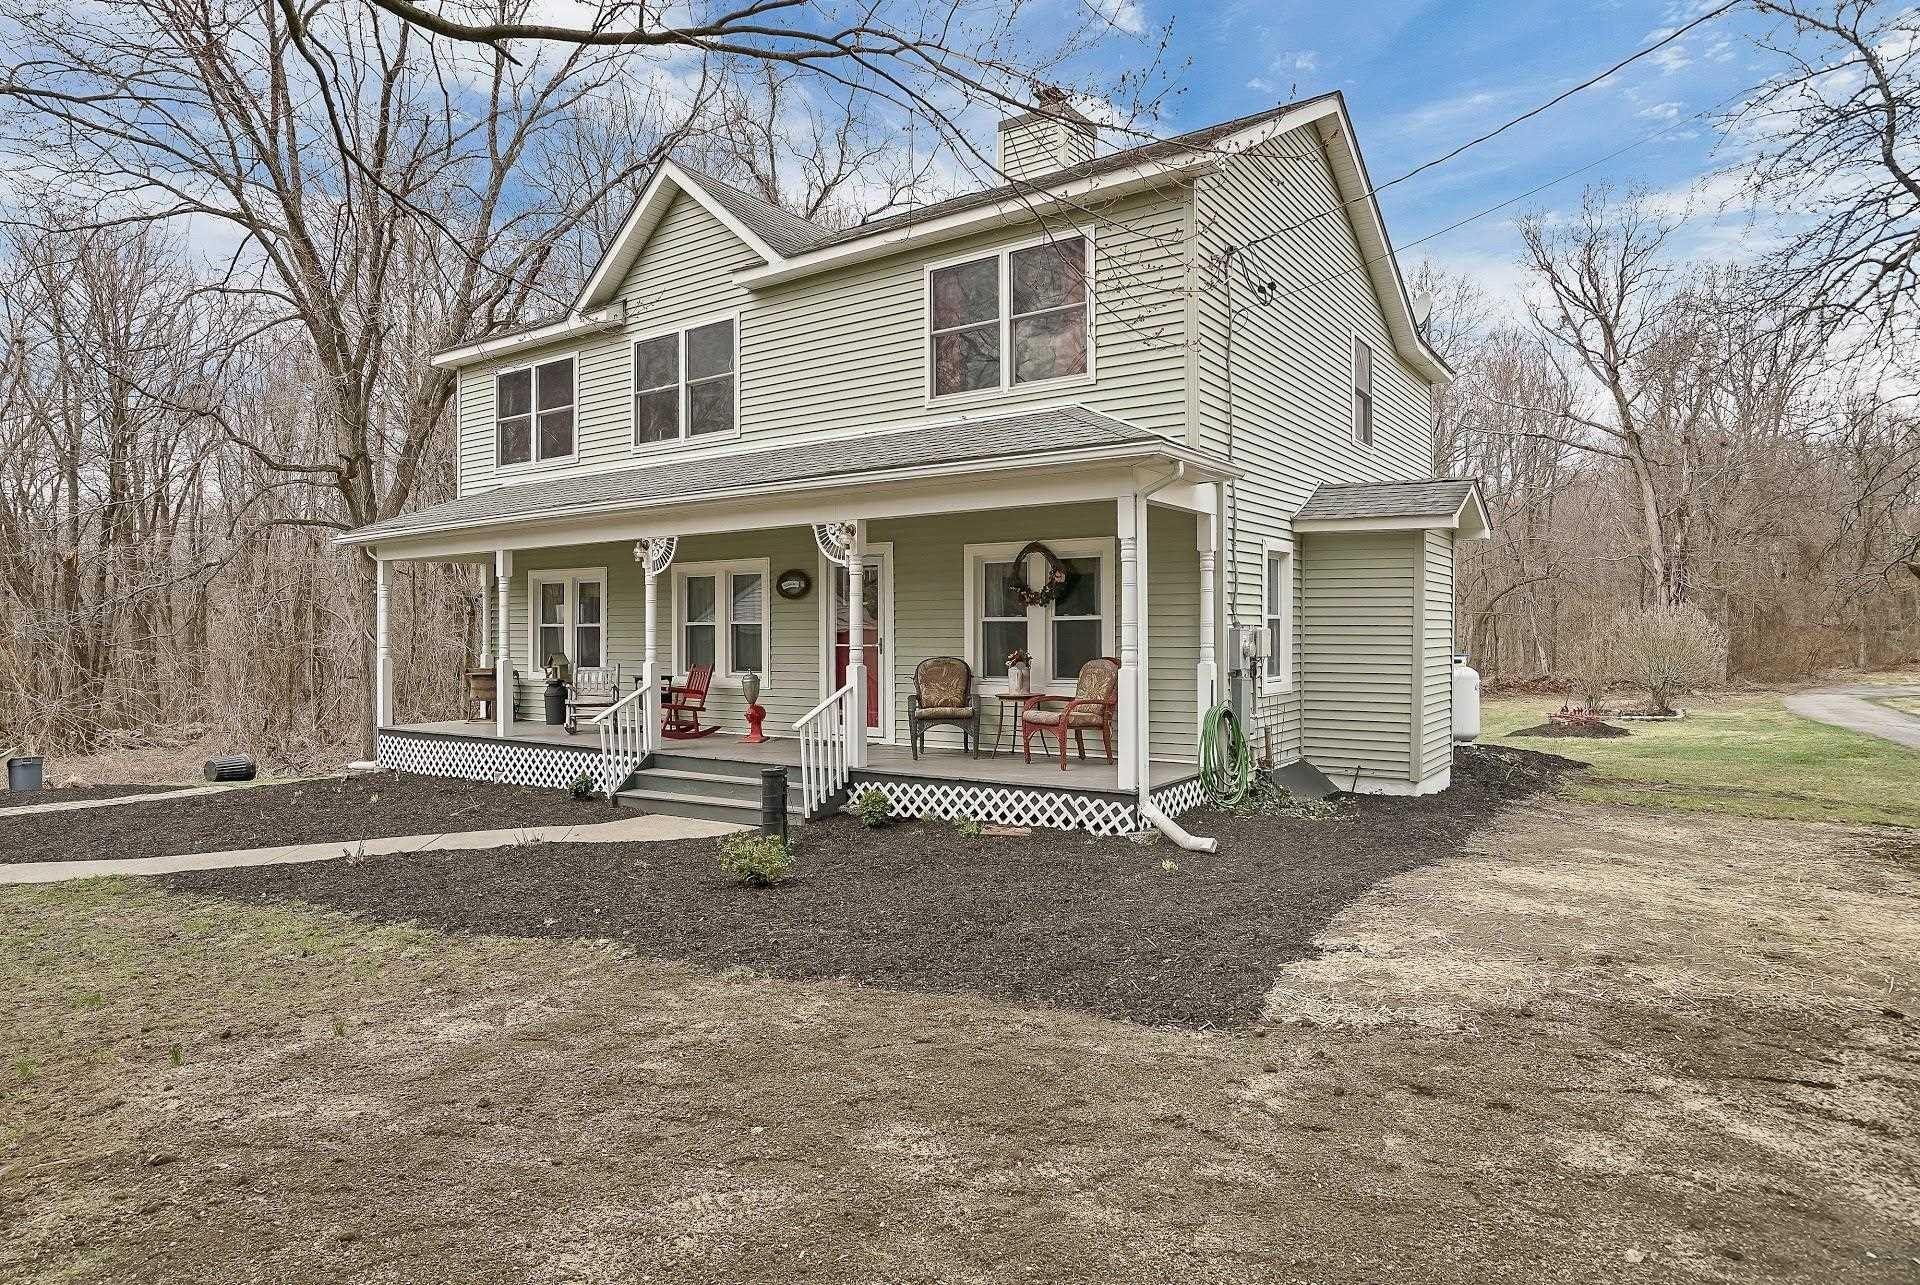 79 SARVIS LN, Newburgh, NY 12550 - #: 399182